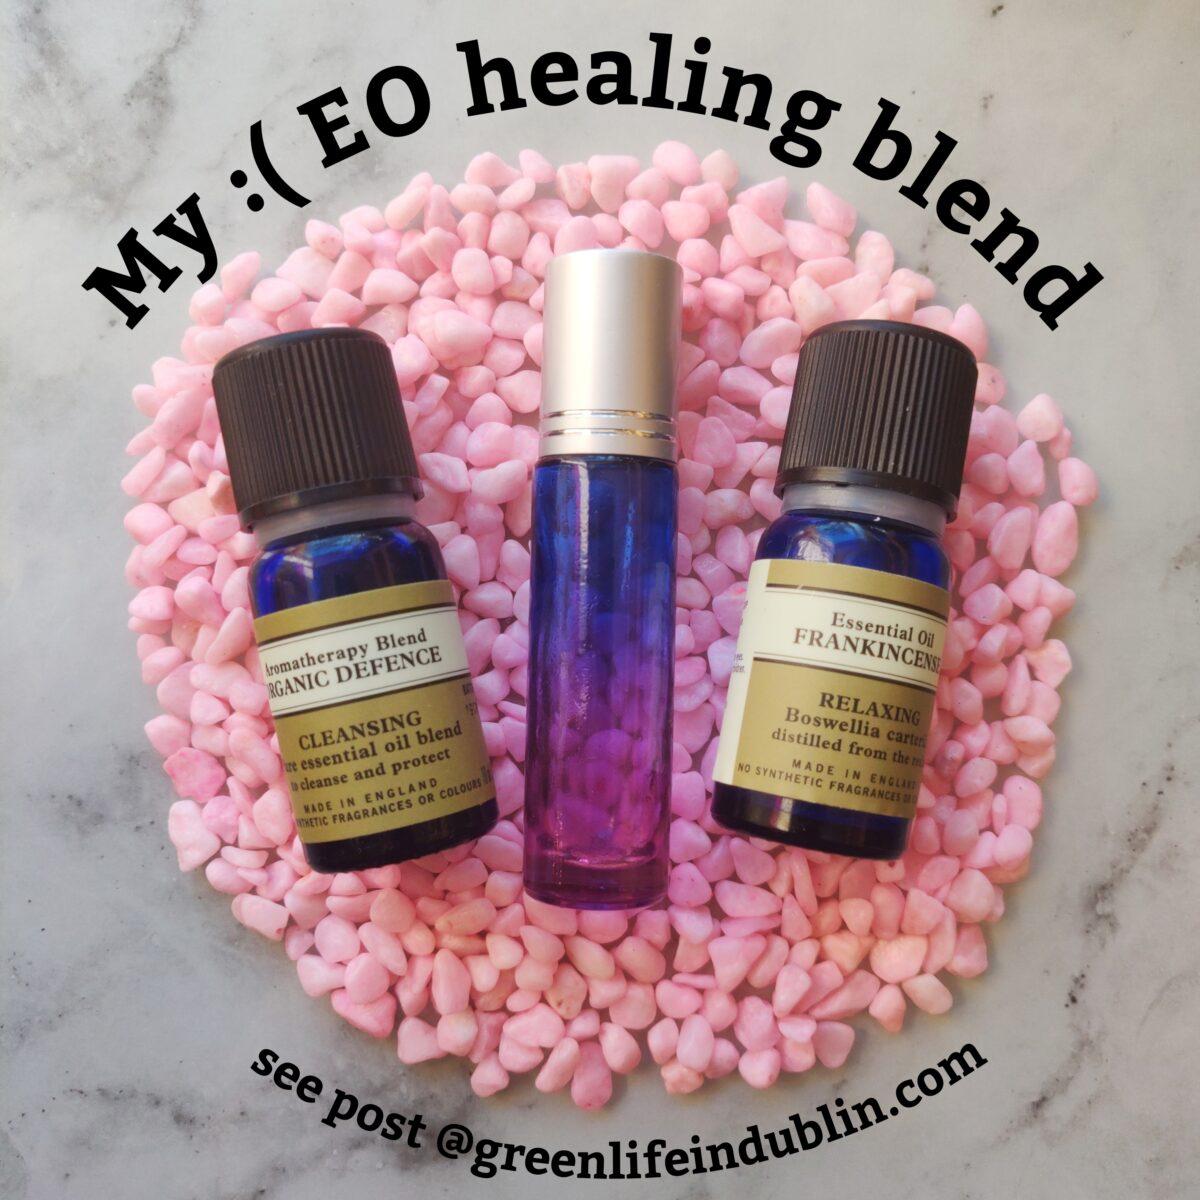 My Healing Essential Oil Blend